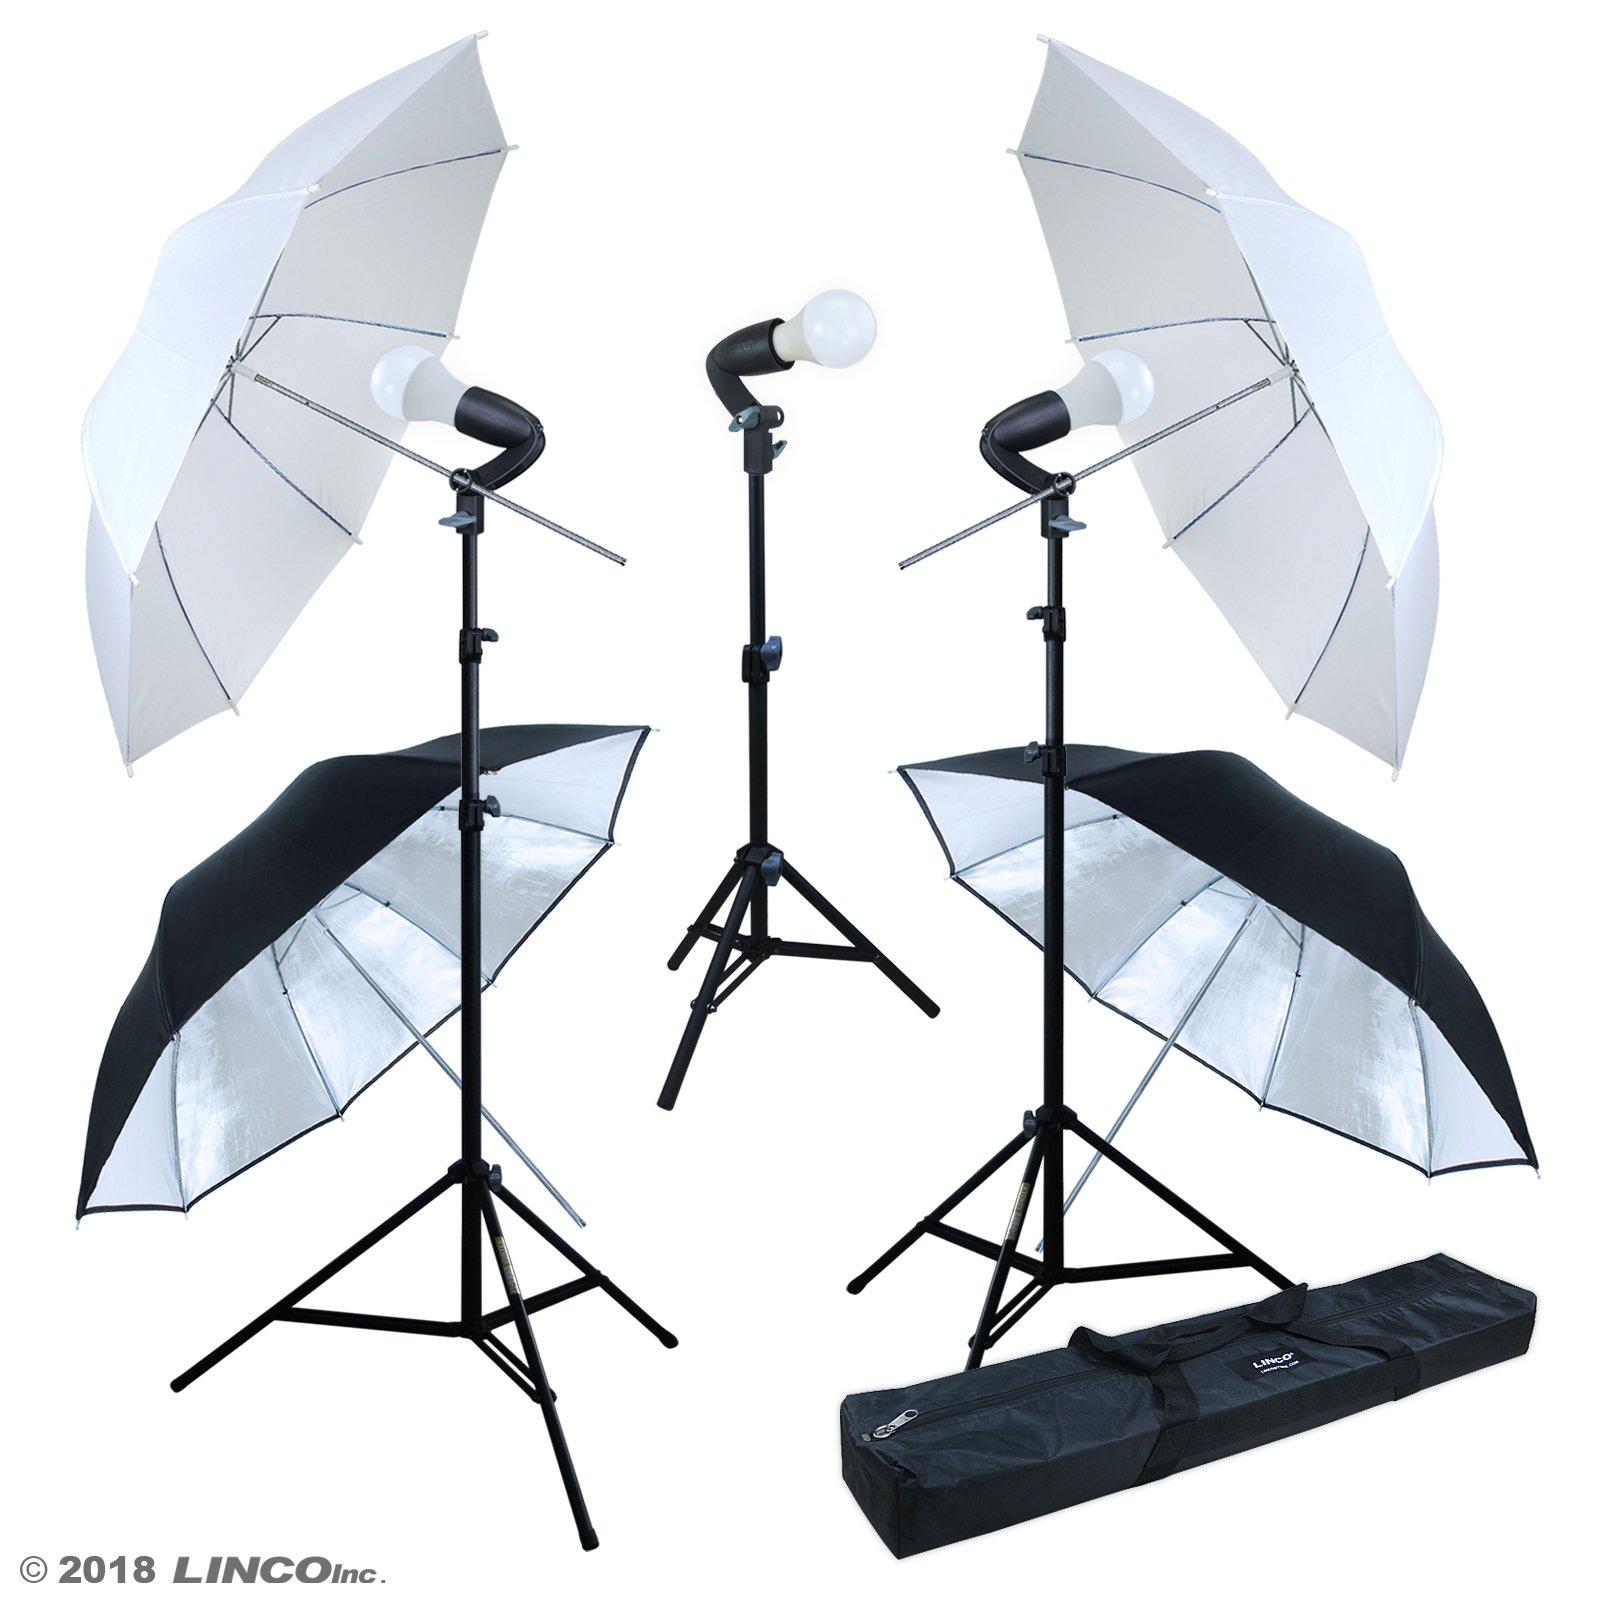 LINCO Lincostore Studio Lighting LED 2400 Lumens Umbrella Light Kit AM249